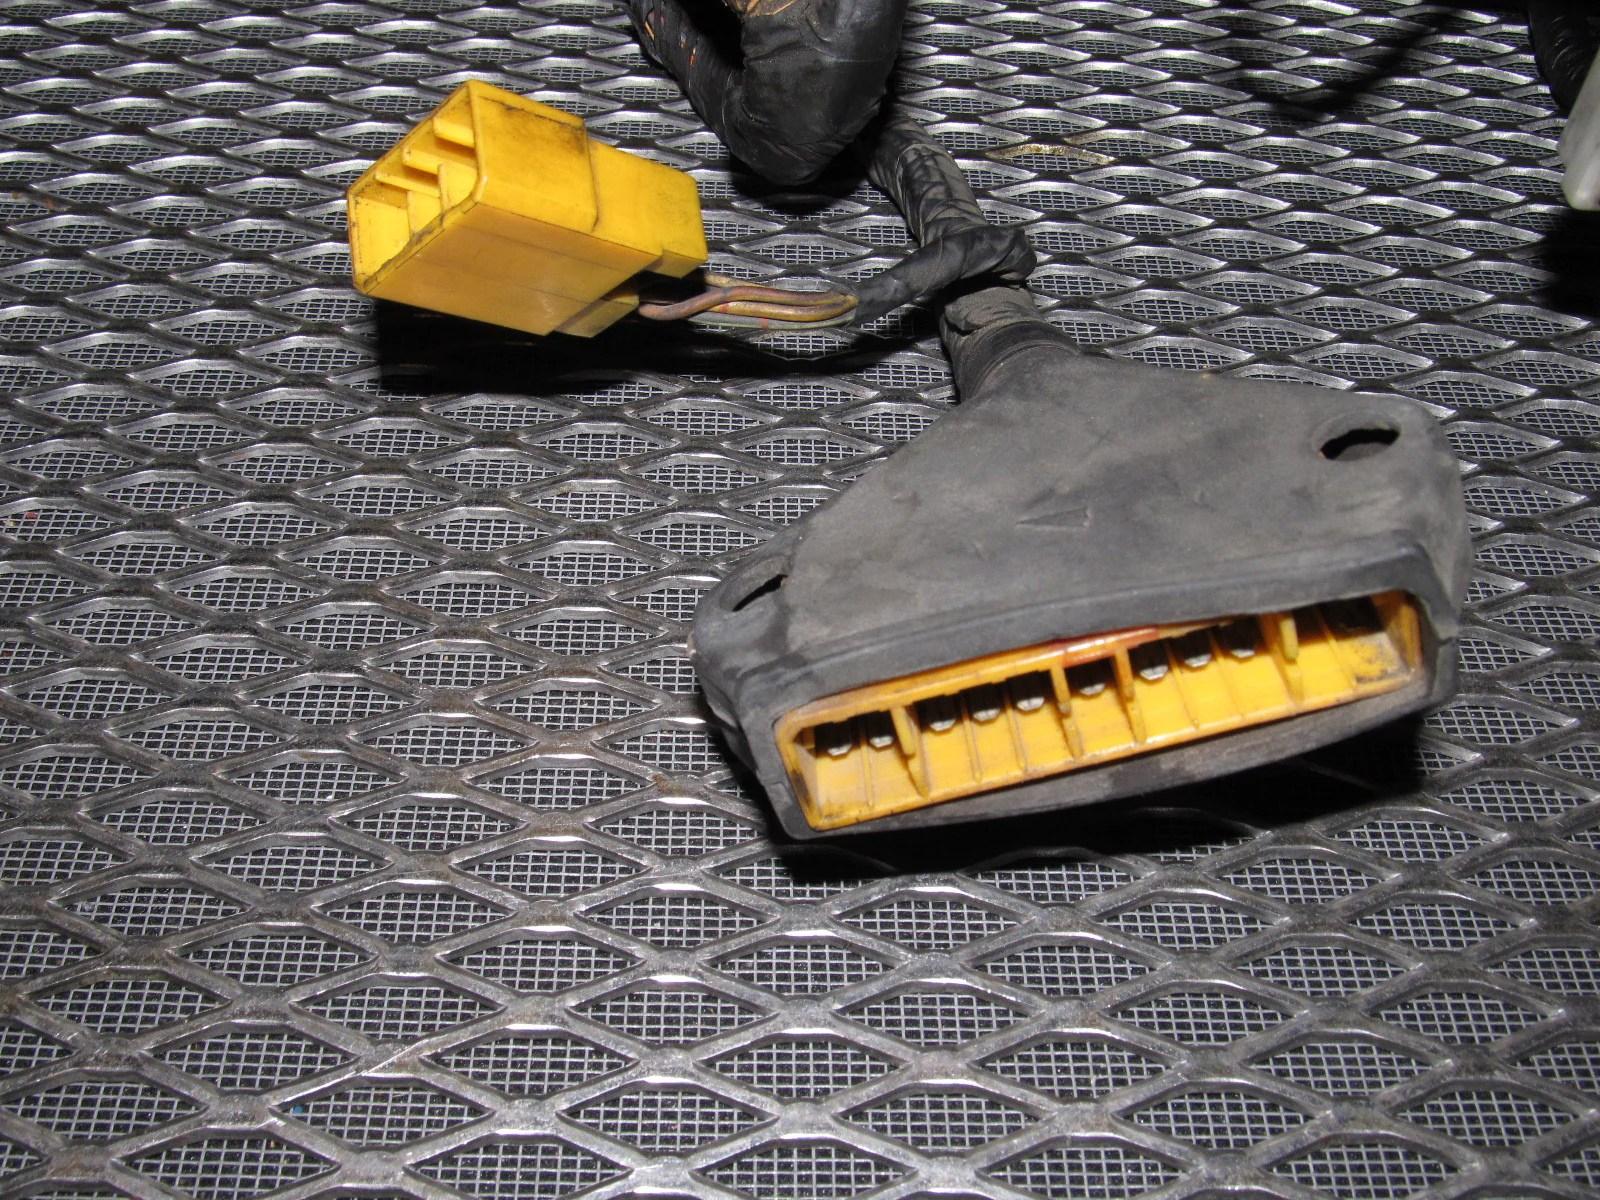 hight resolution of 84 85 mazda rx7 oem 12a engine wiring harness m t u2013 autopartone com84 85 mazda